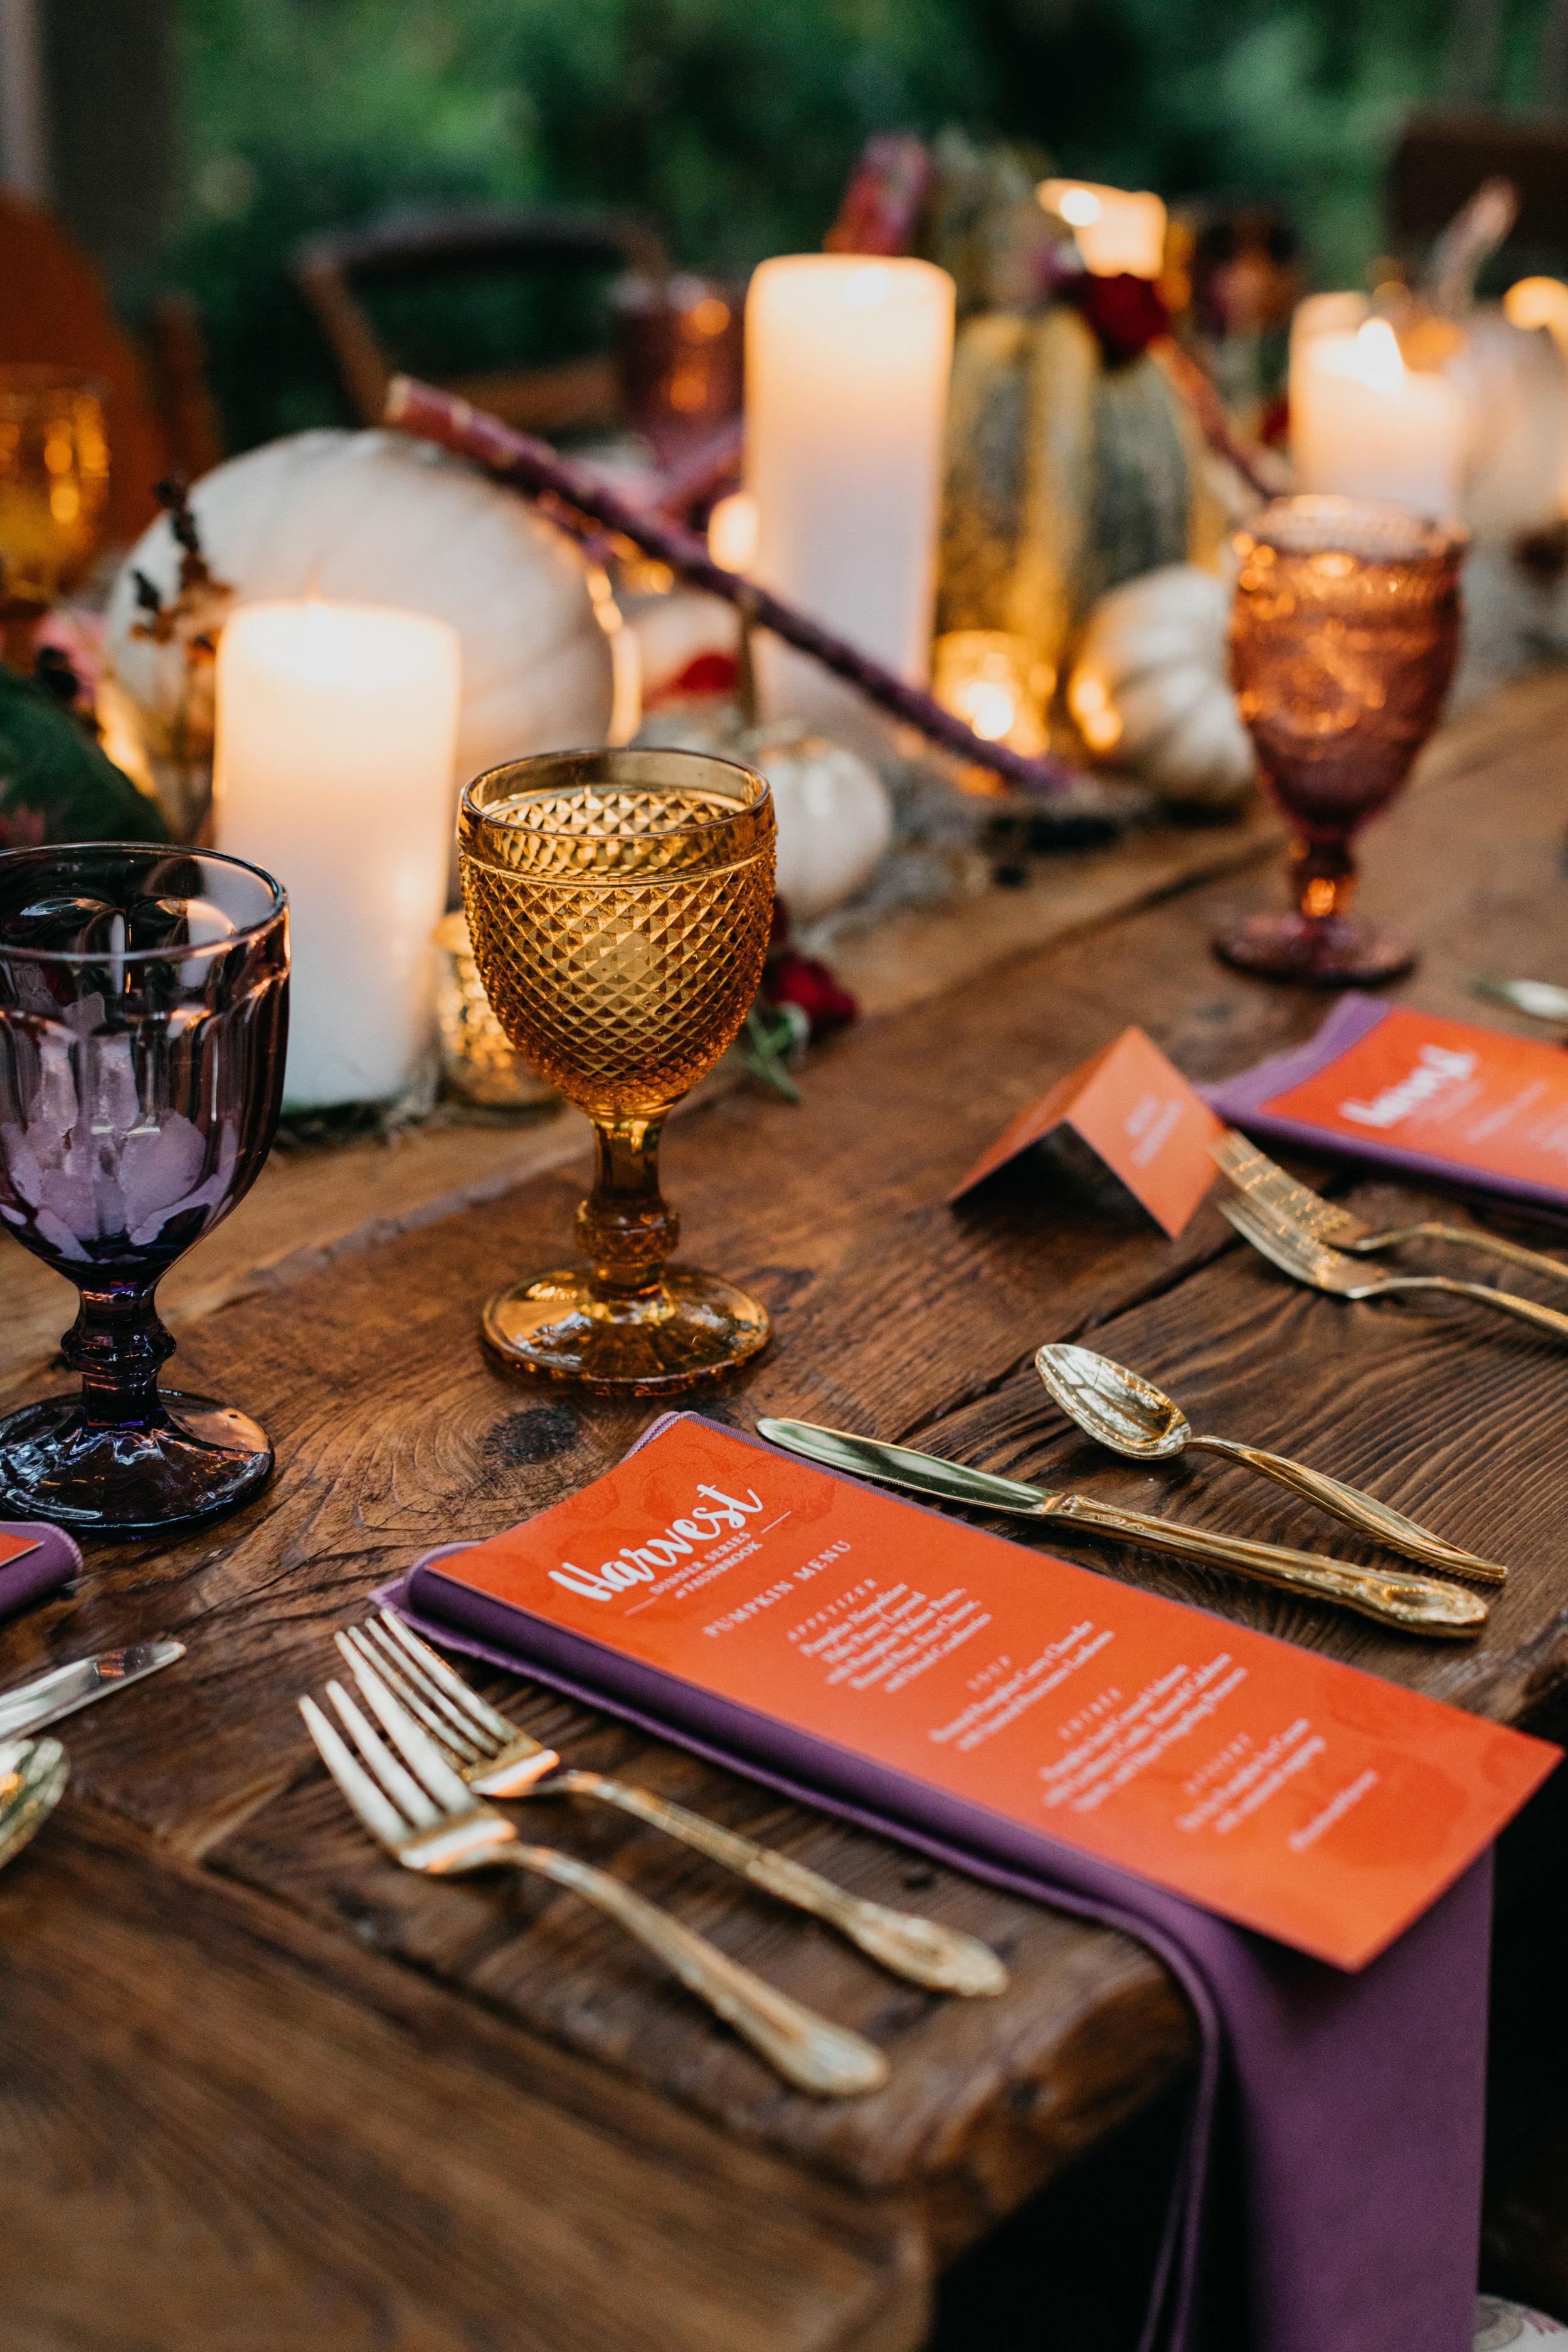 West-Chester-PA-Faunbrook-Harvest-Dinner-Series-Pumpkin-JustinJohnson-86.jpg